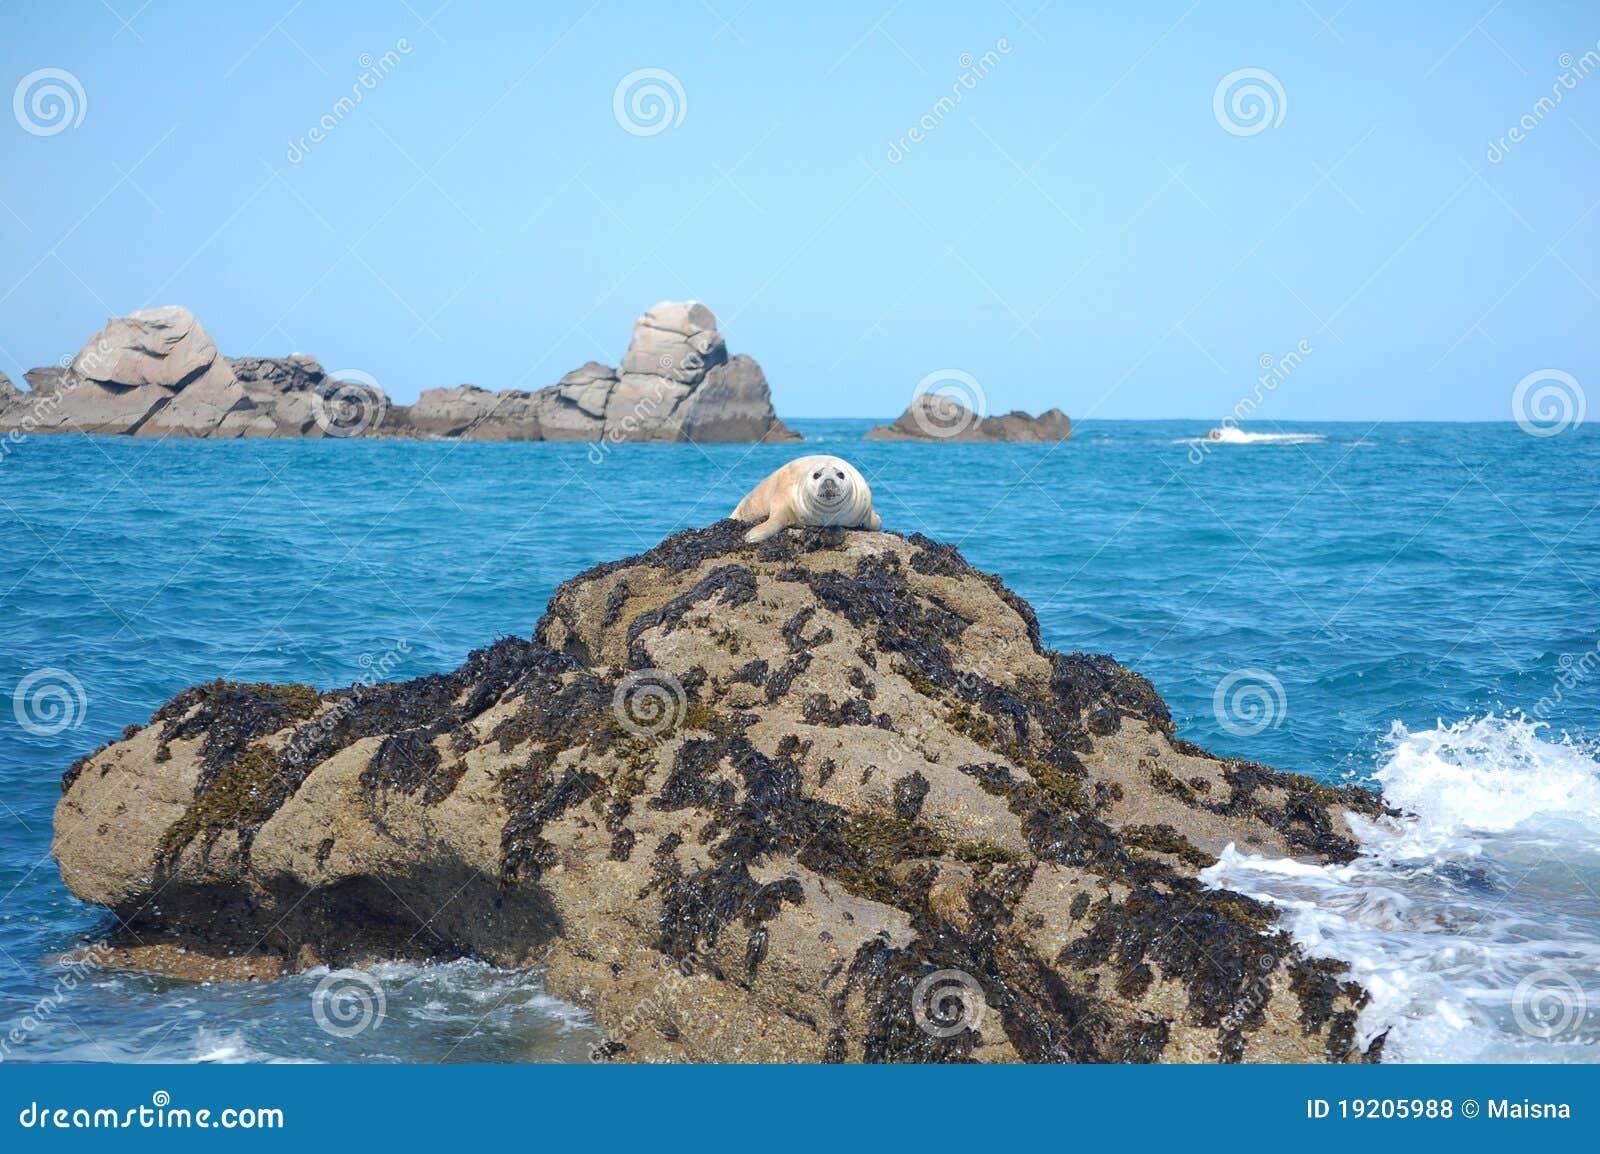 Grey seal pup on rock